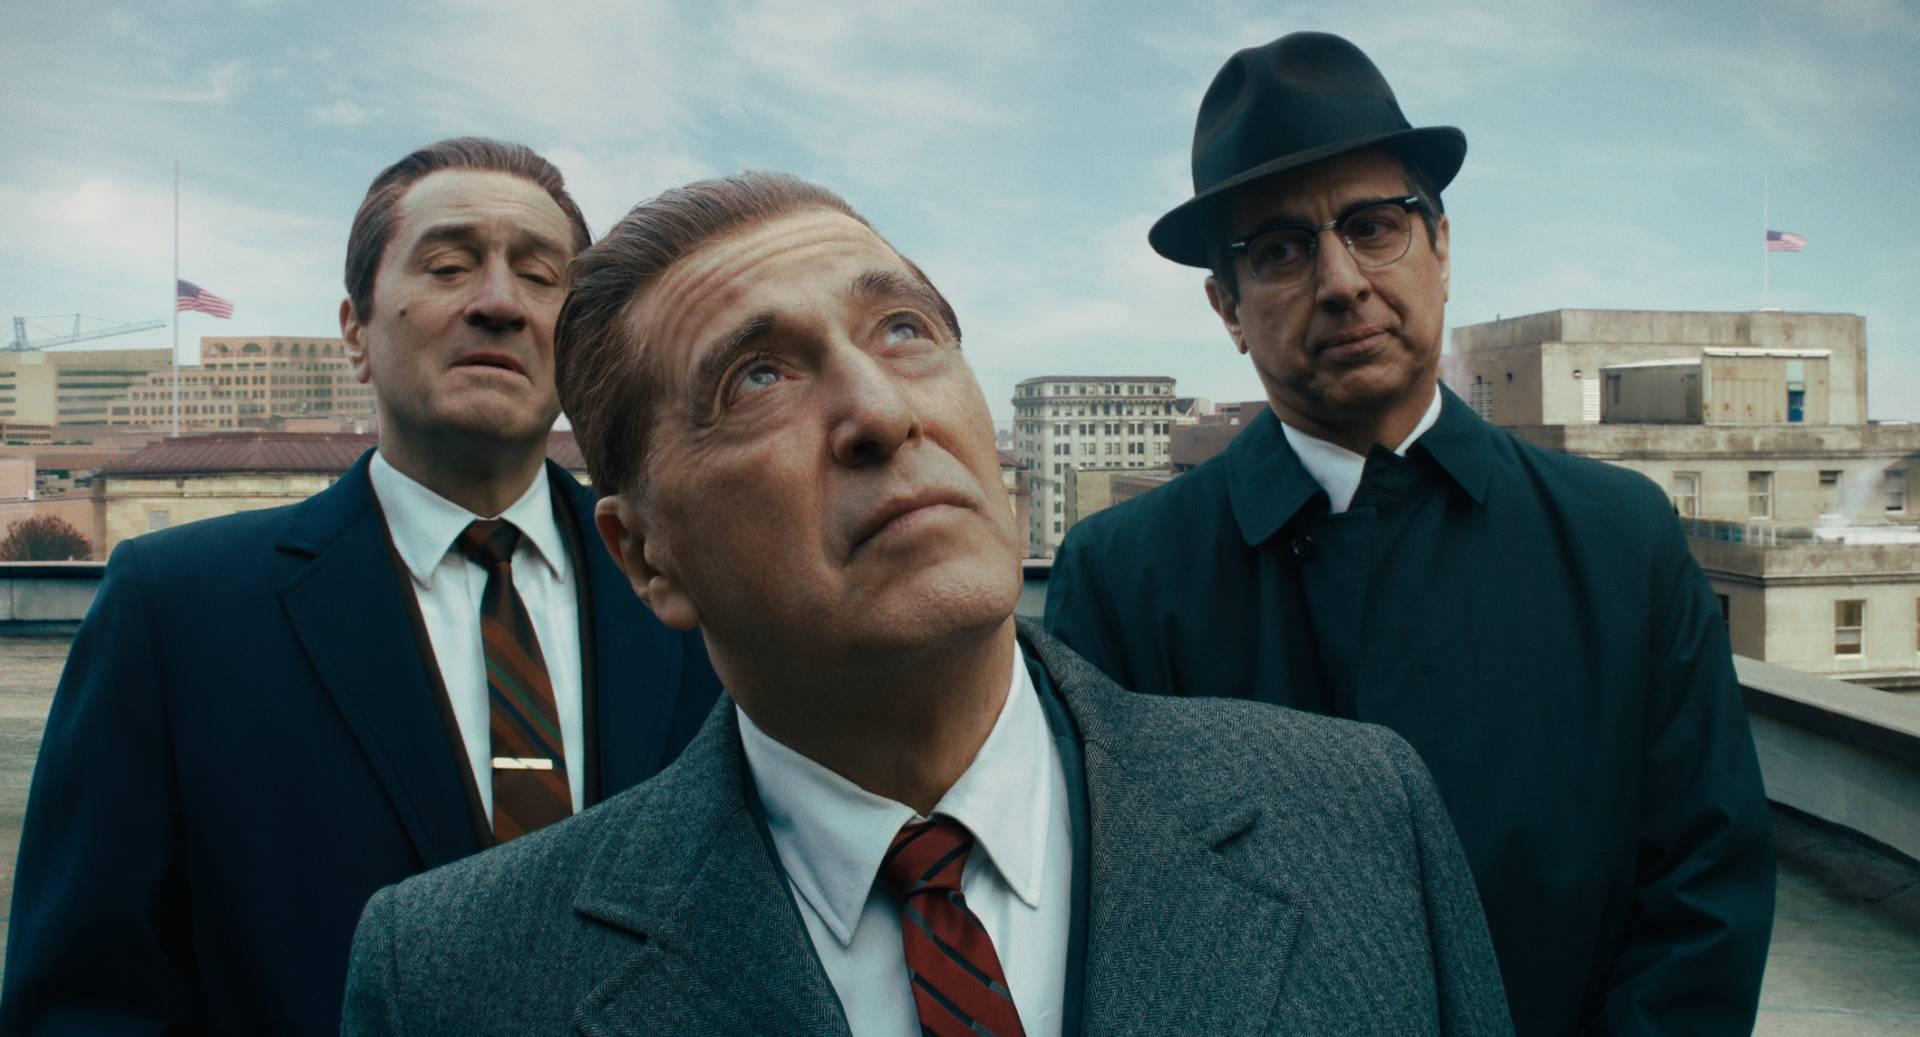 (From left) Robert De Niro, Al Pacino and Ray Romano in a scene from 'The Irishman'. Photo: Netflix